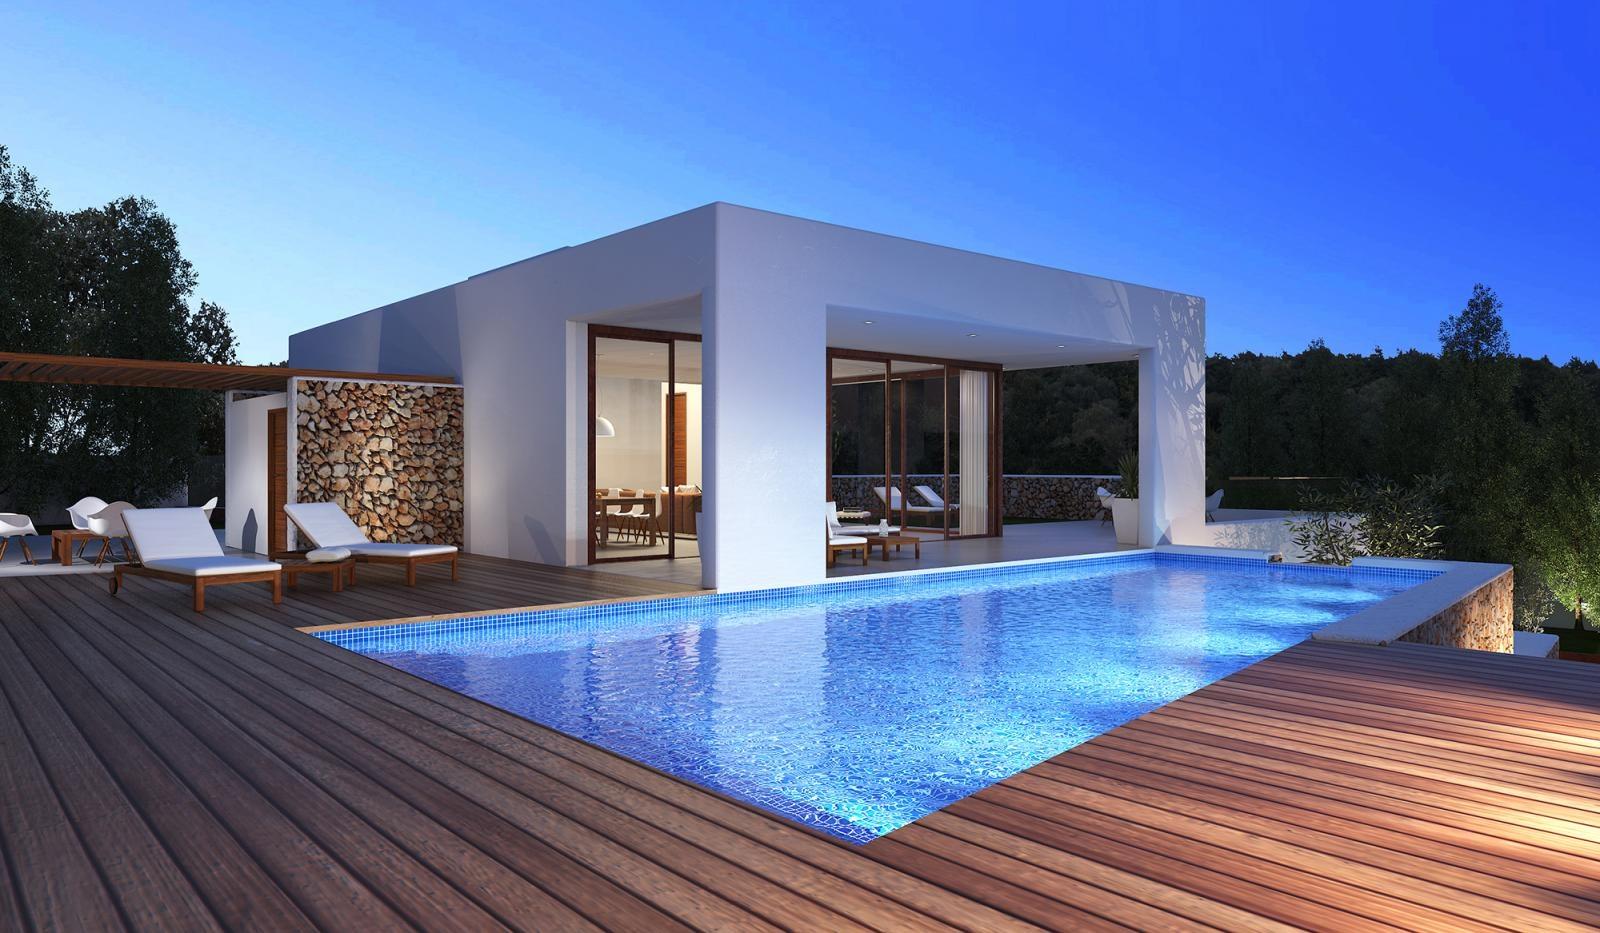 hg hamburg la finca 3 schlafzimmer villa i j vea. Black Bedroom Furniture Sets. Home Design Ideas